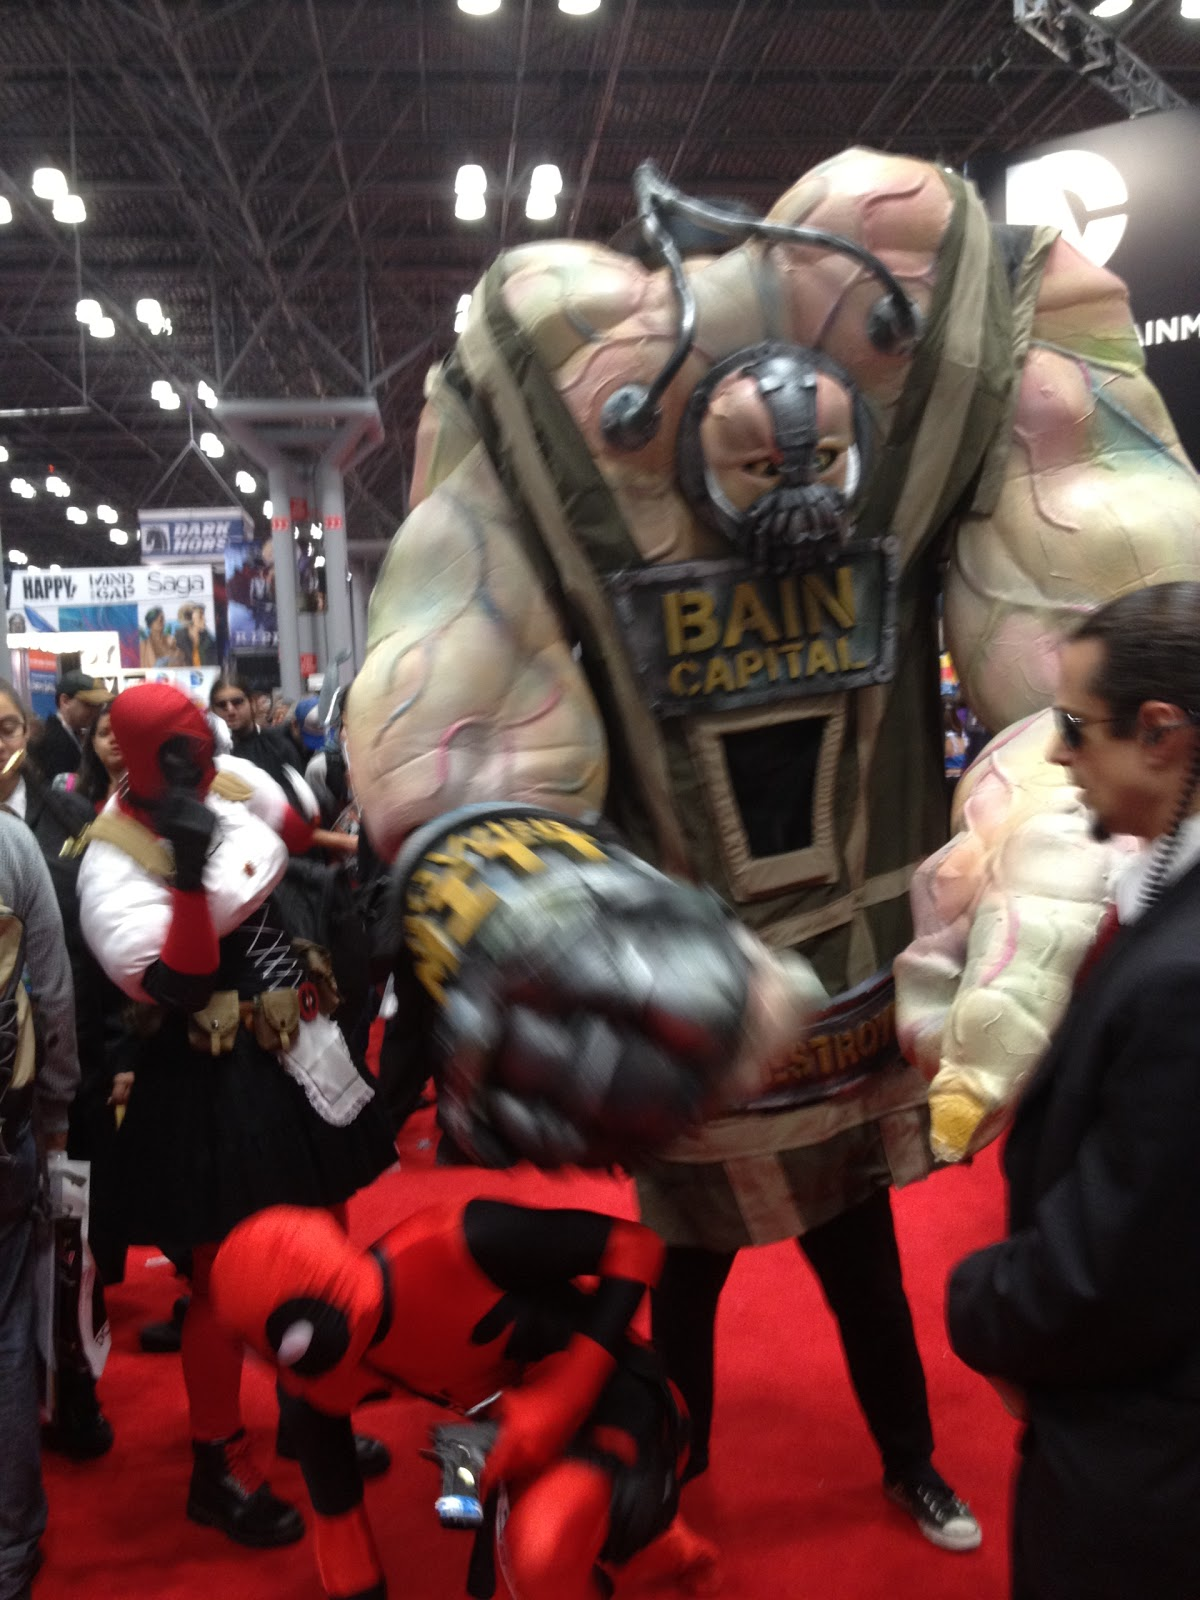 The Sound A Doggy Makes & The Sound A Doggy Makes: The Ballsiest Costumes of NY Comic Con 2012!